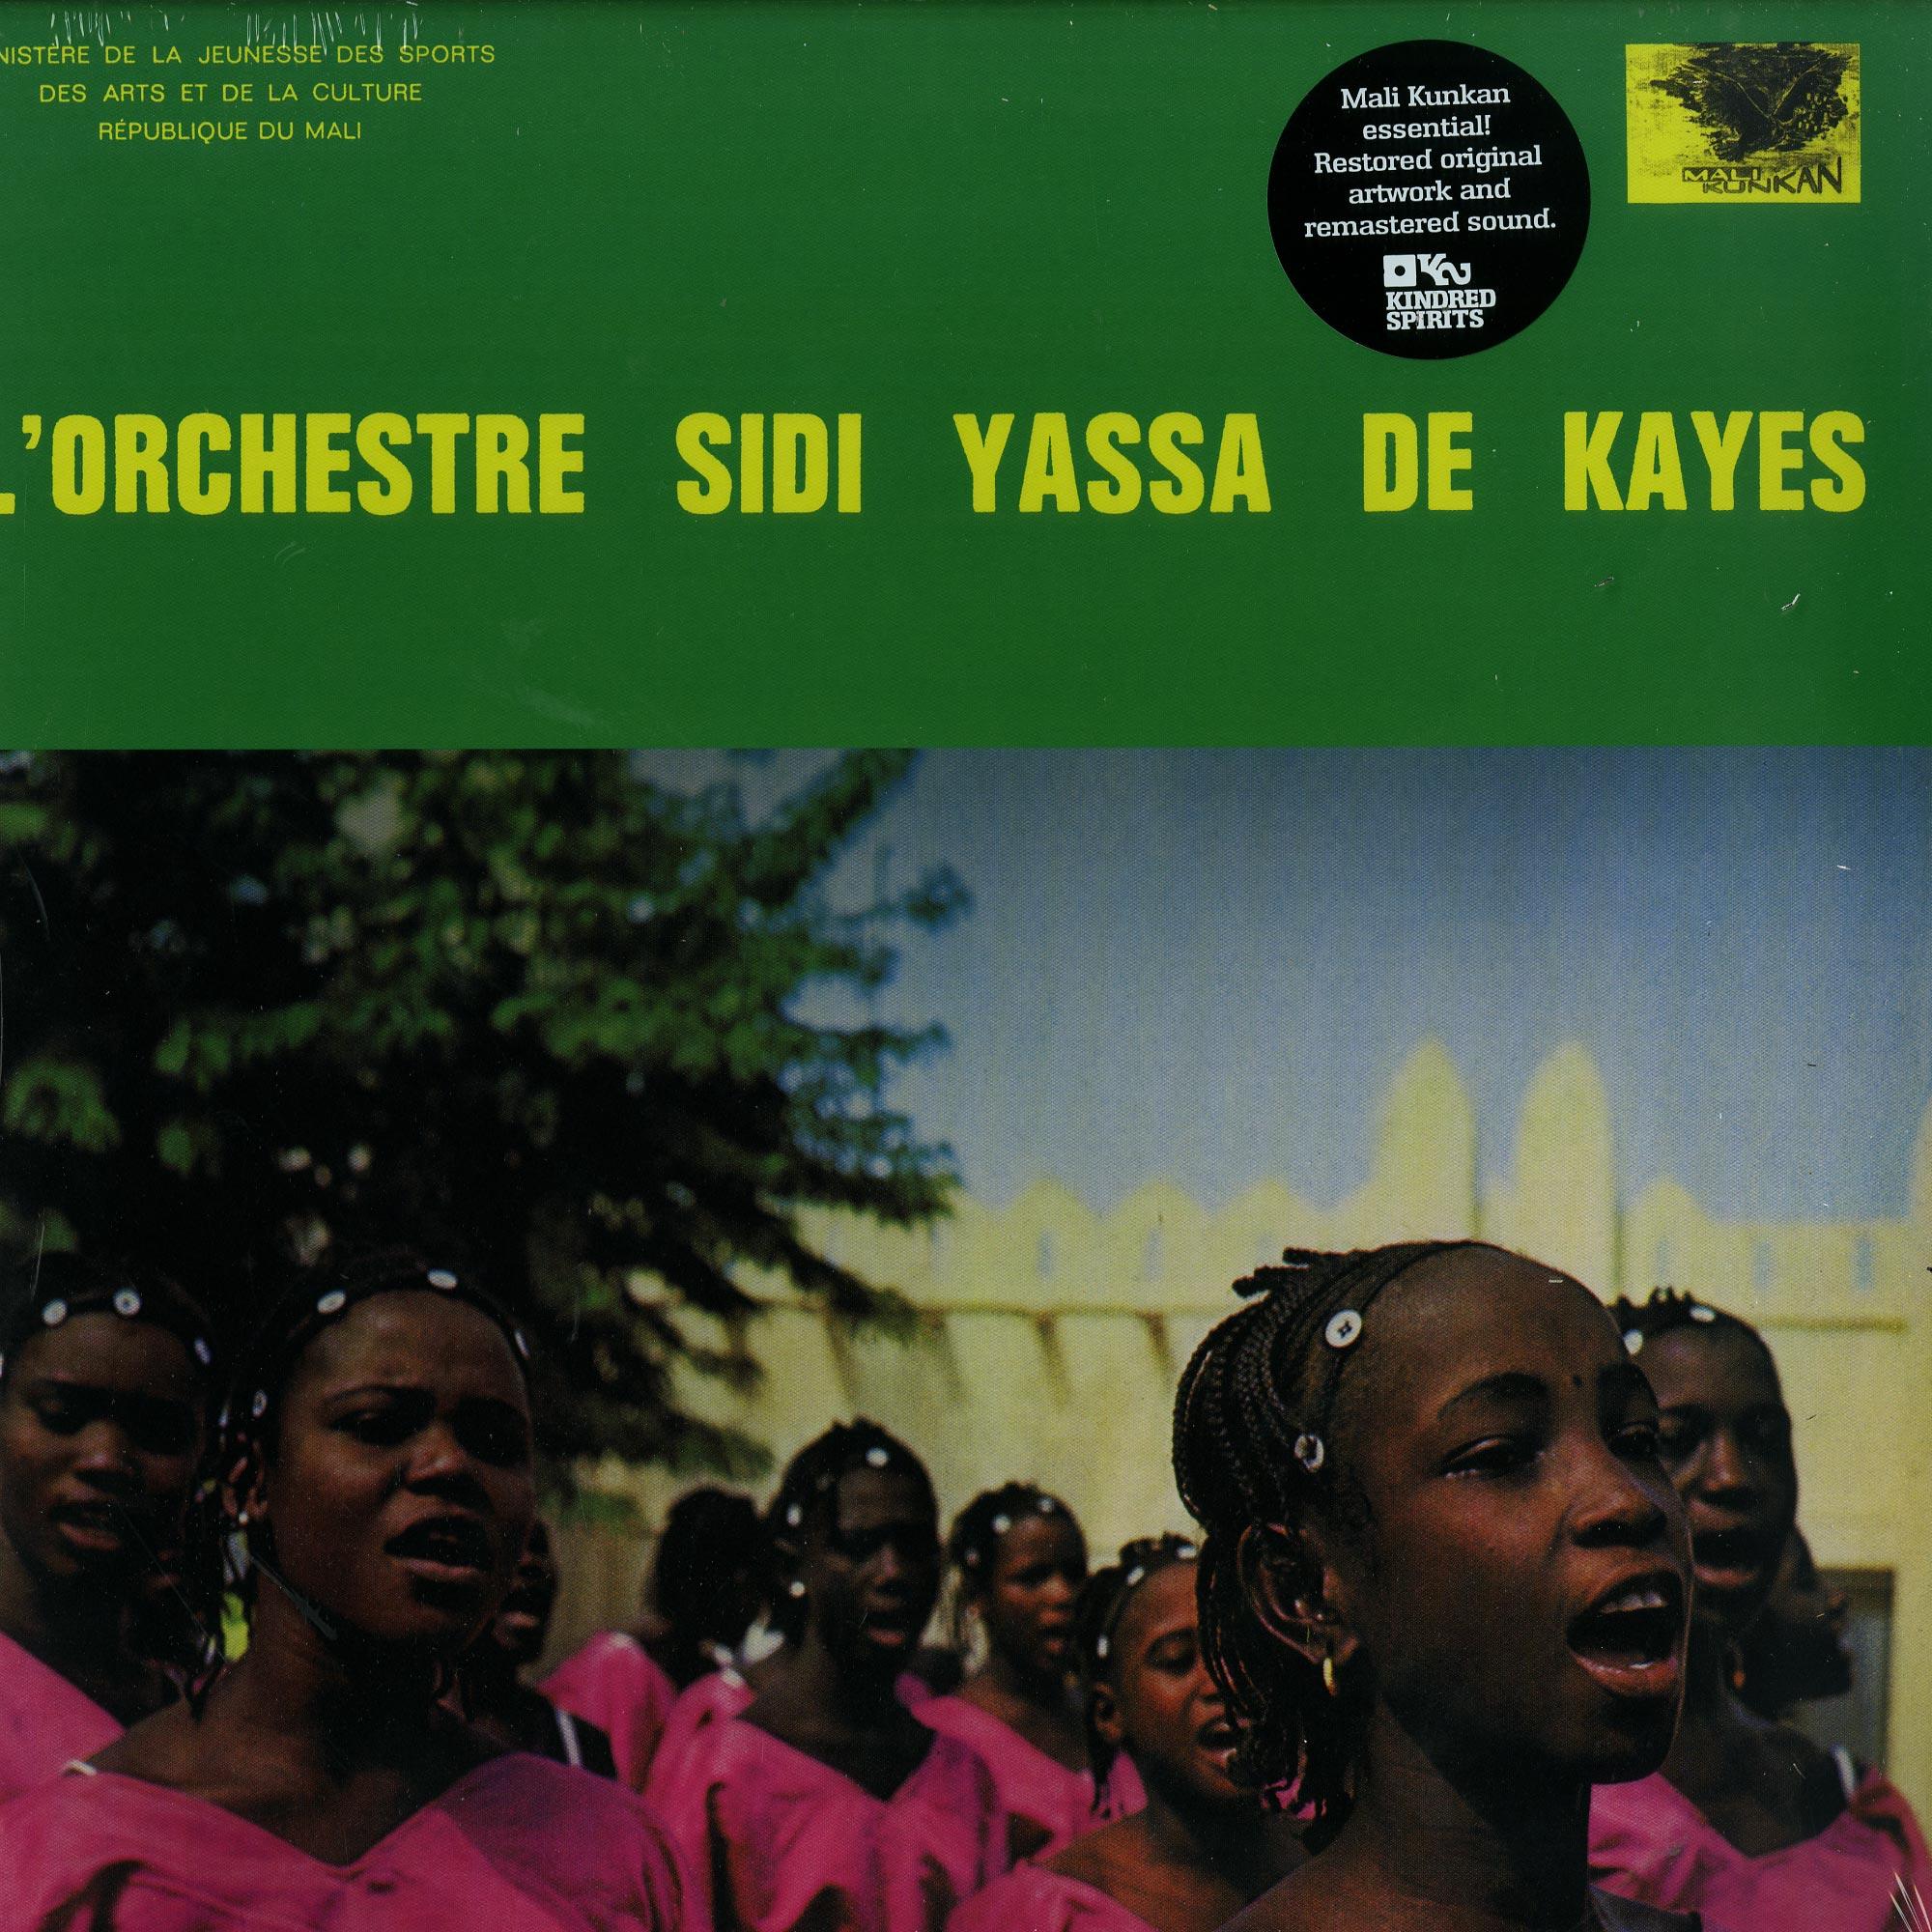 L Orchestre Sidi Yassa De Kayes - L ORCHESTRE SIDI YASSA DE KAYES